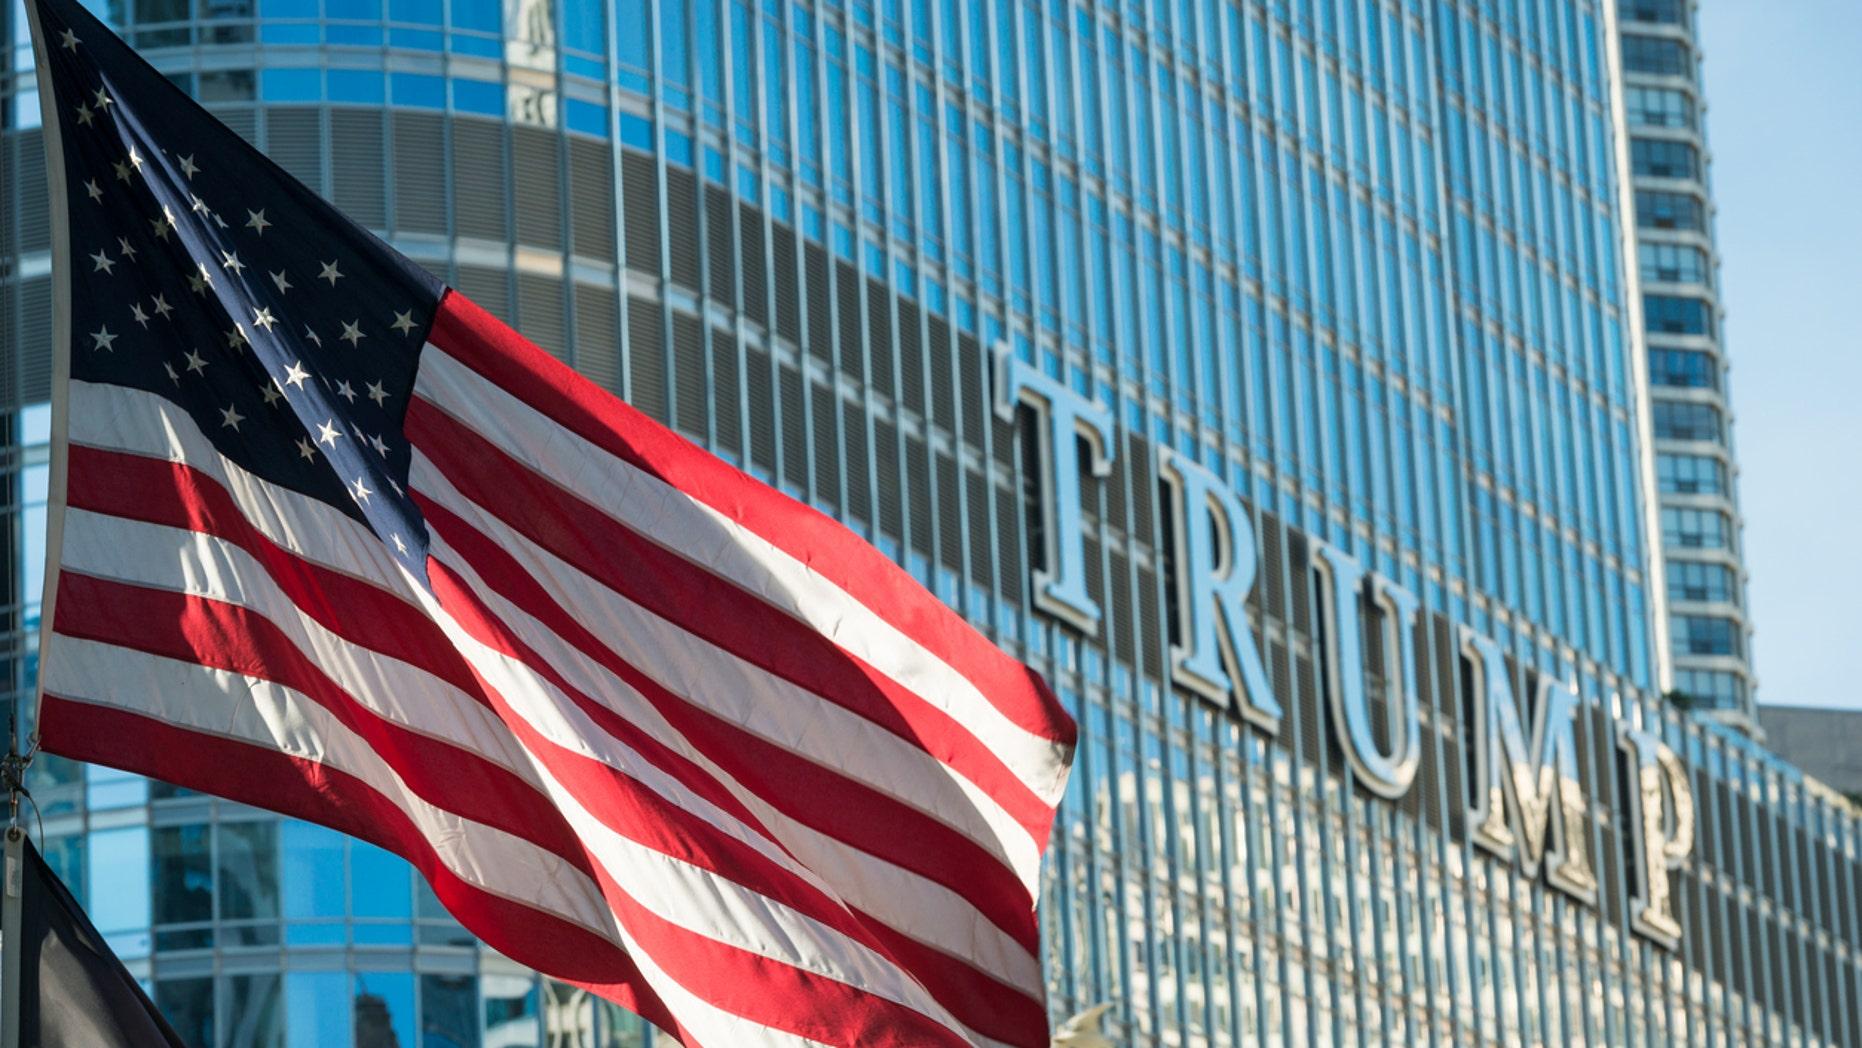 Trump Hotels Chicago restaurant is getting slammed on social media.